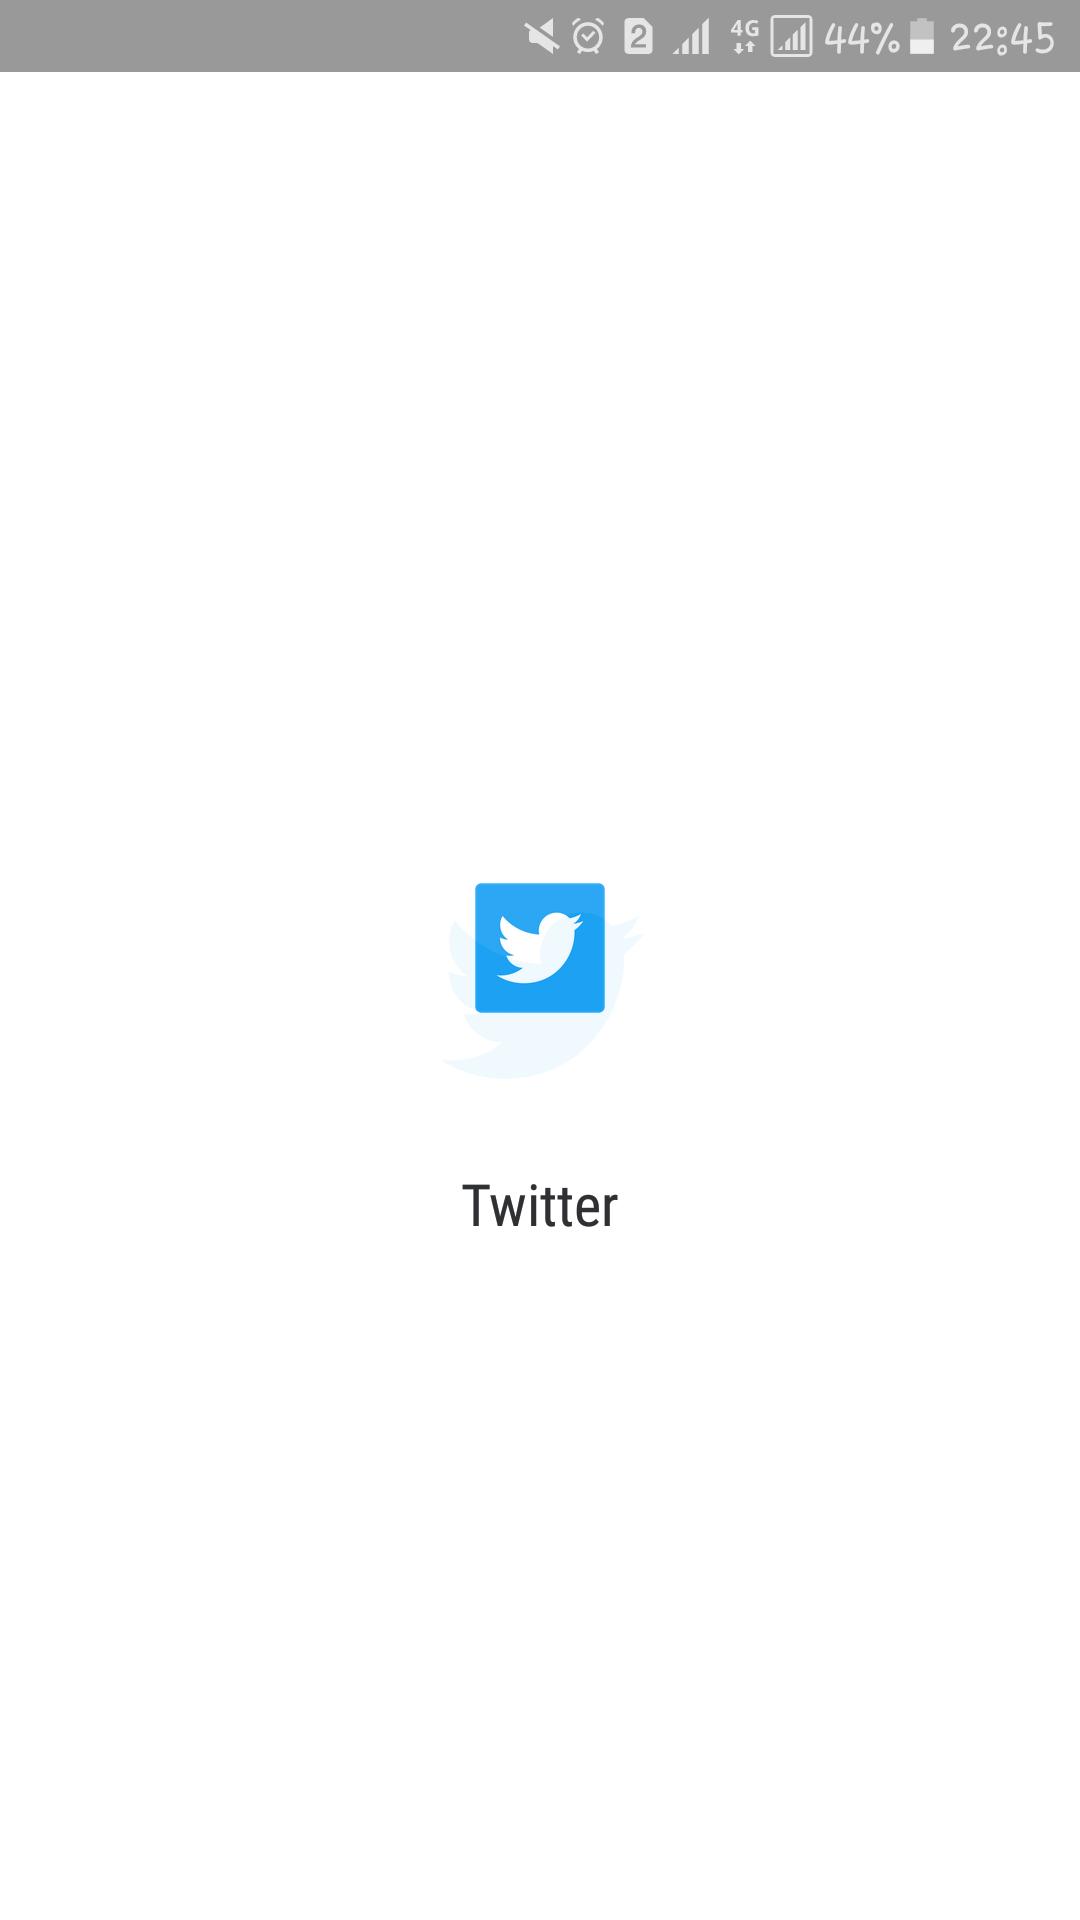 Screenshot_20181122-224531.png